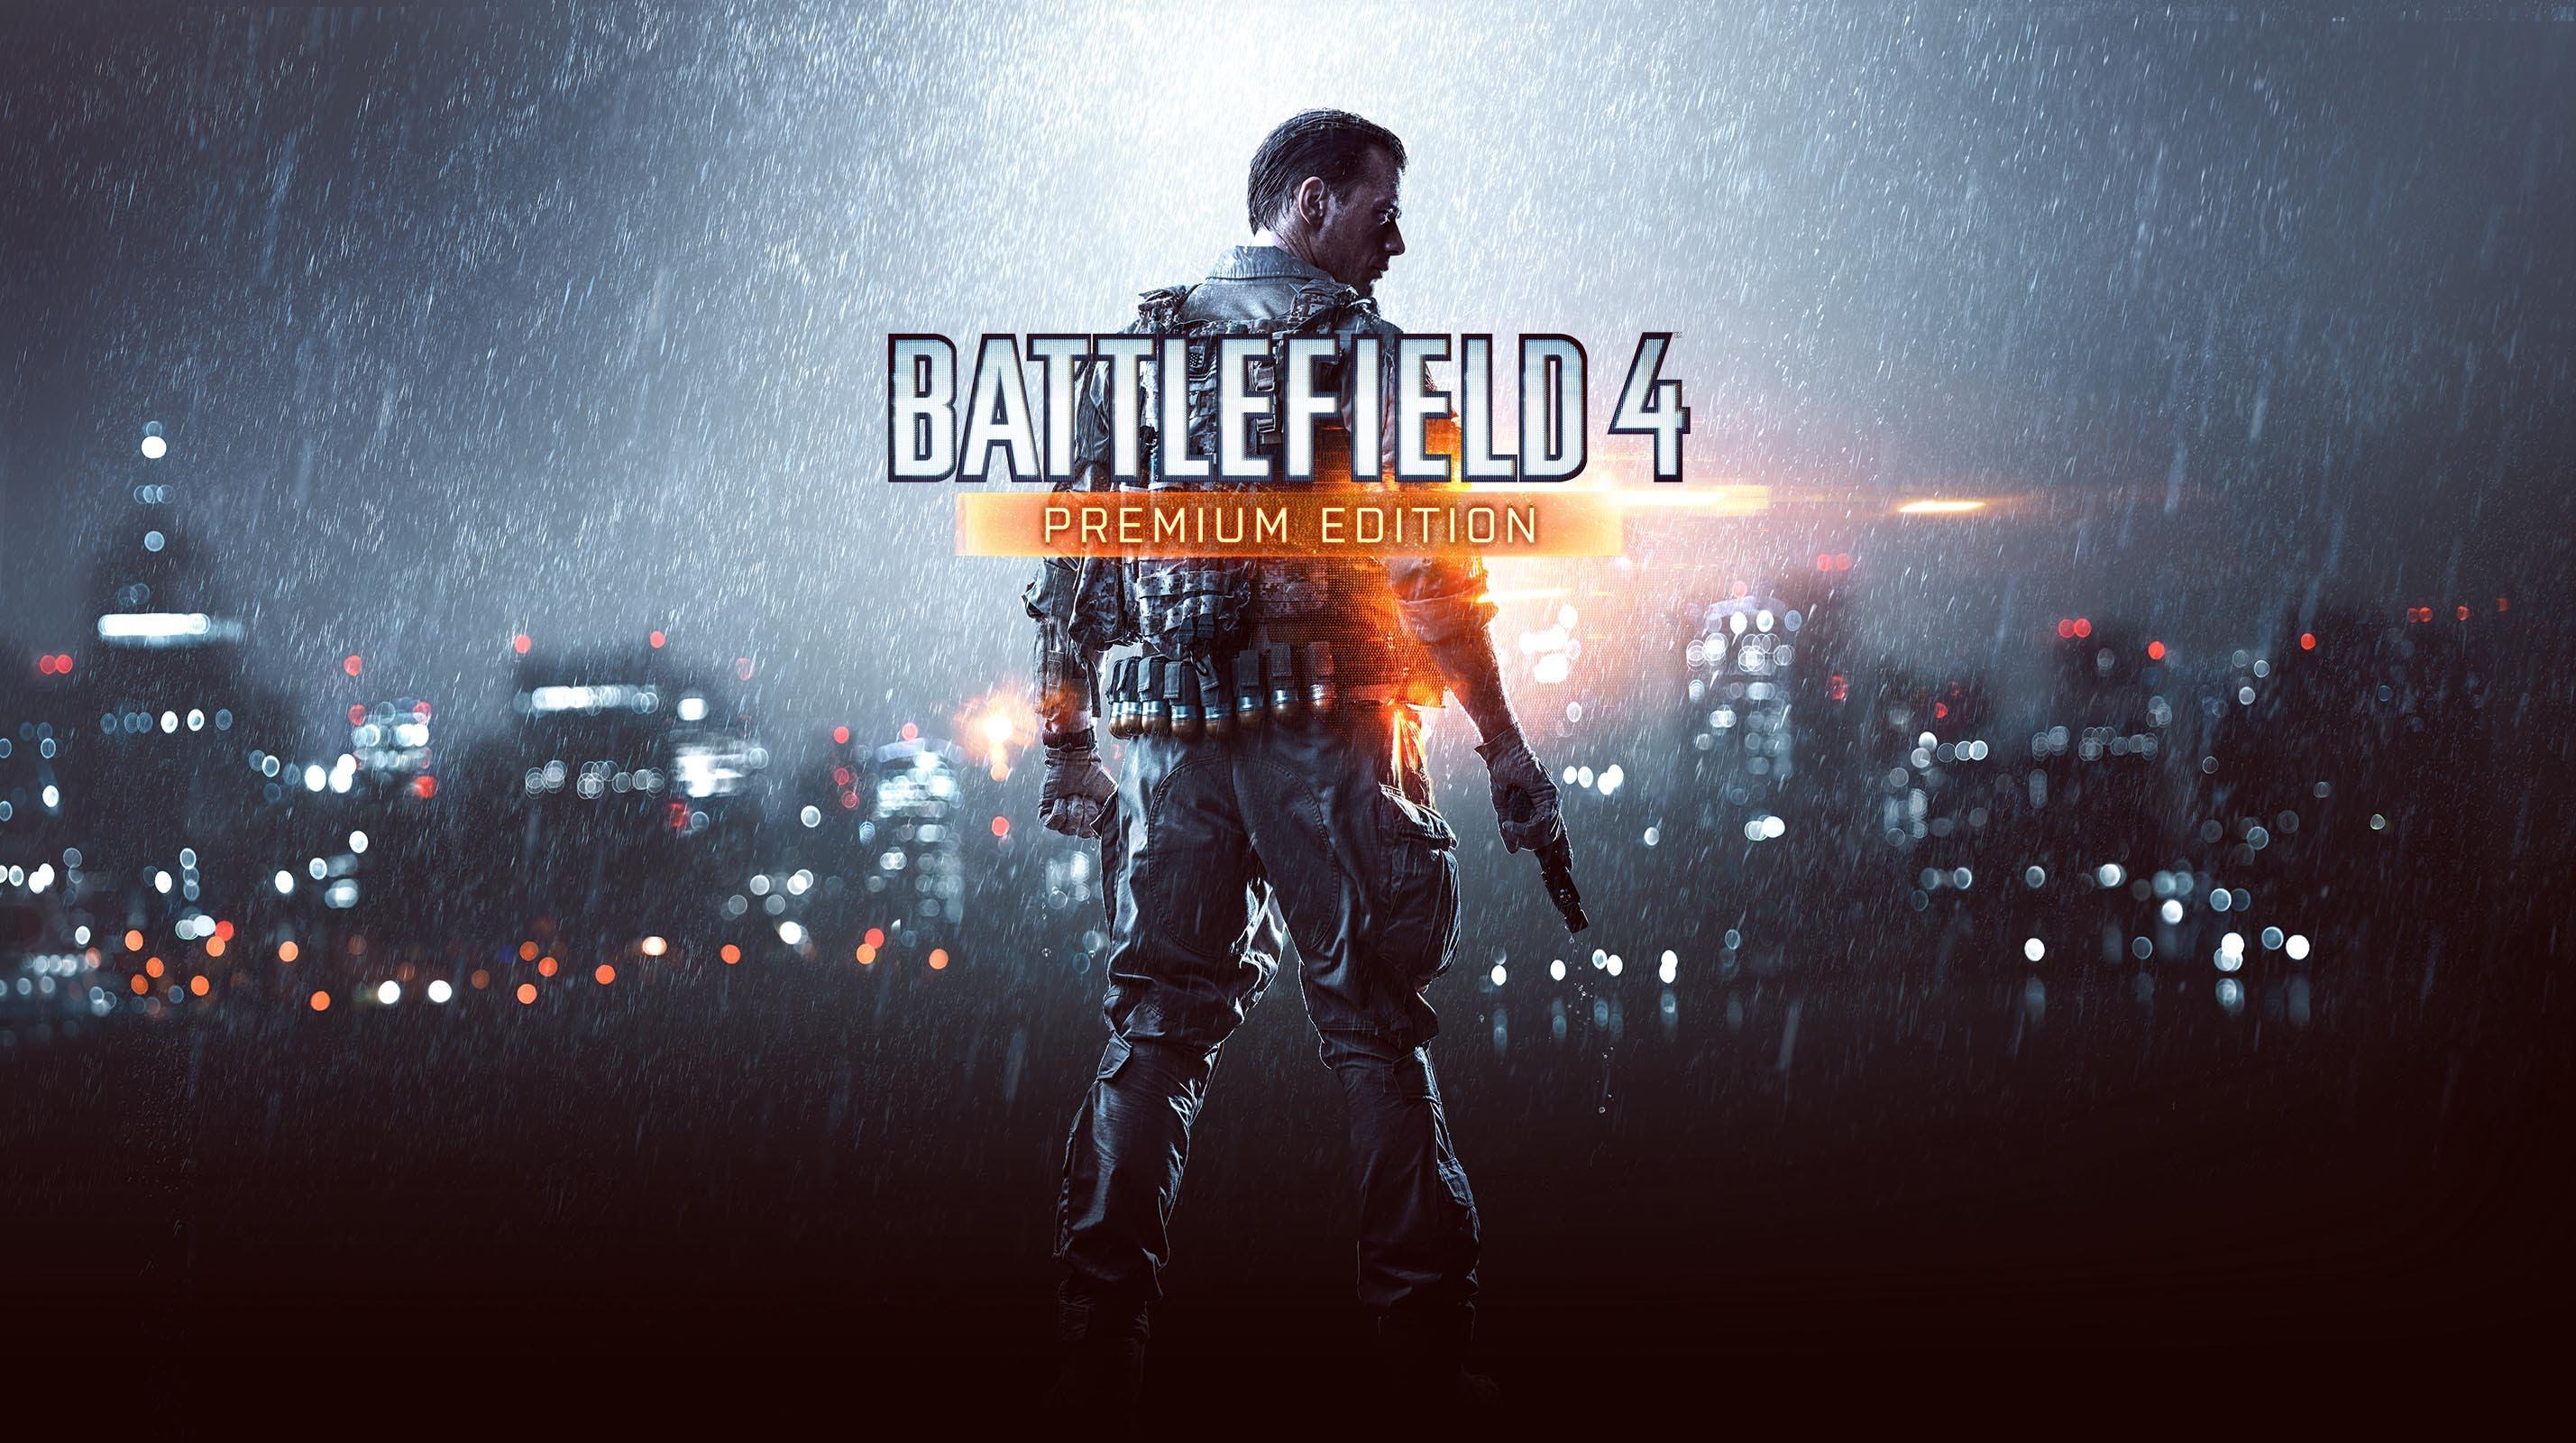 battlefield 4 premium edition keyart